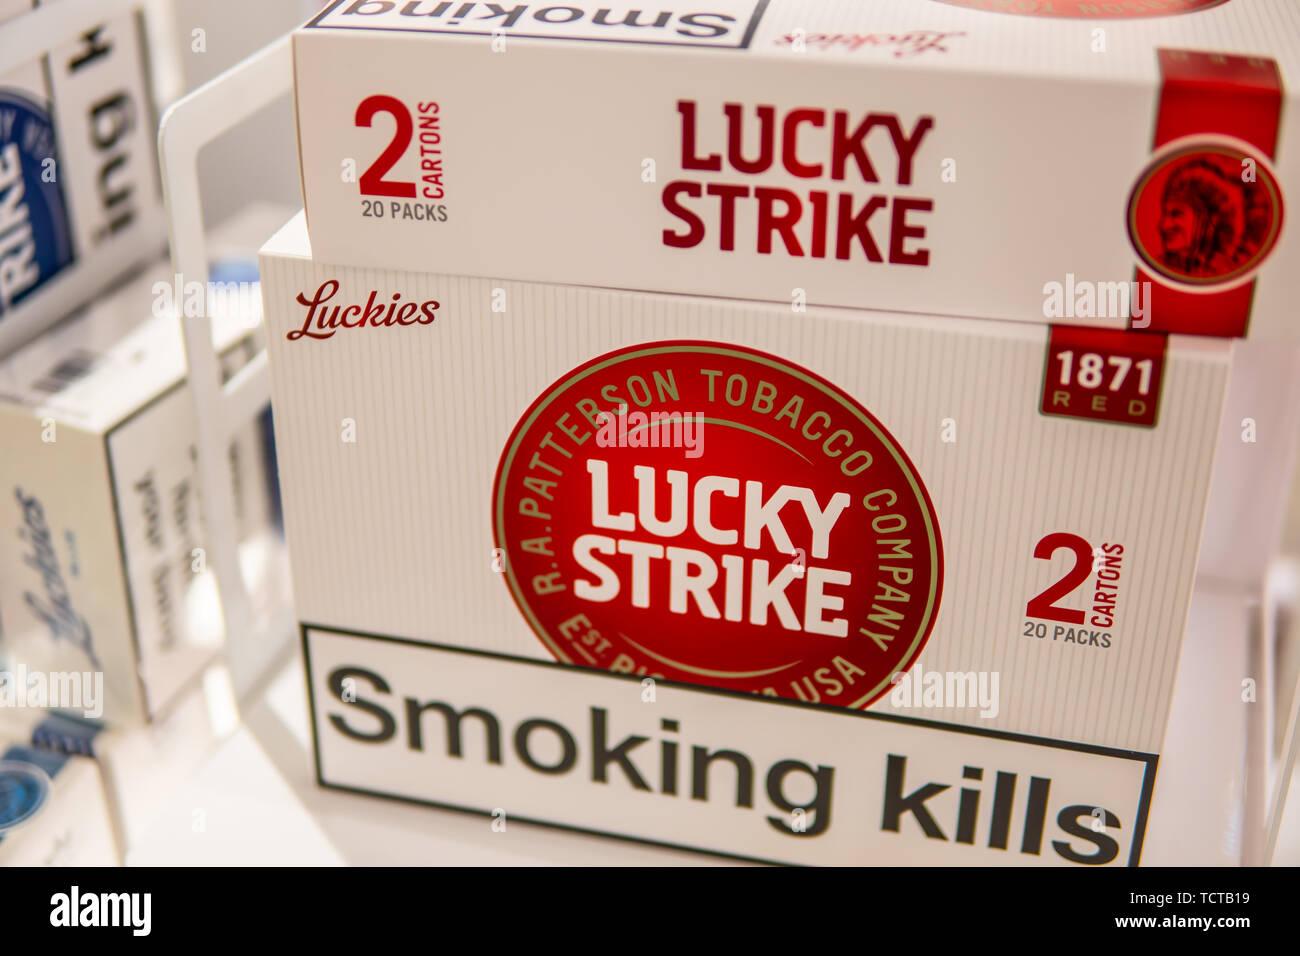 Duty Free Cigarettes Stock Photos & Duty Free Cigarettes